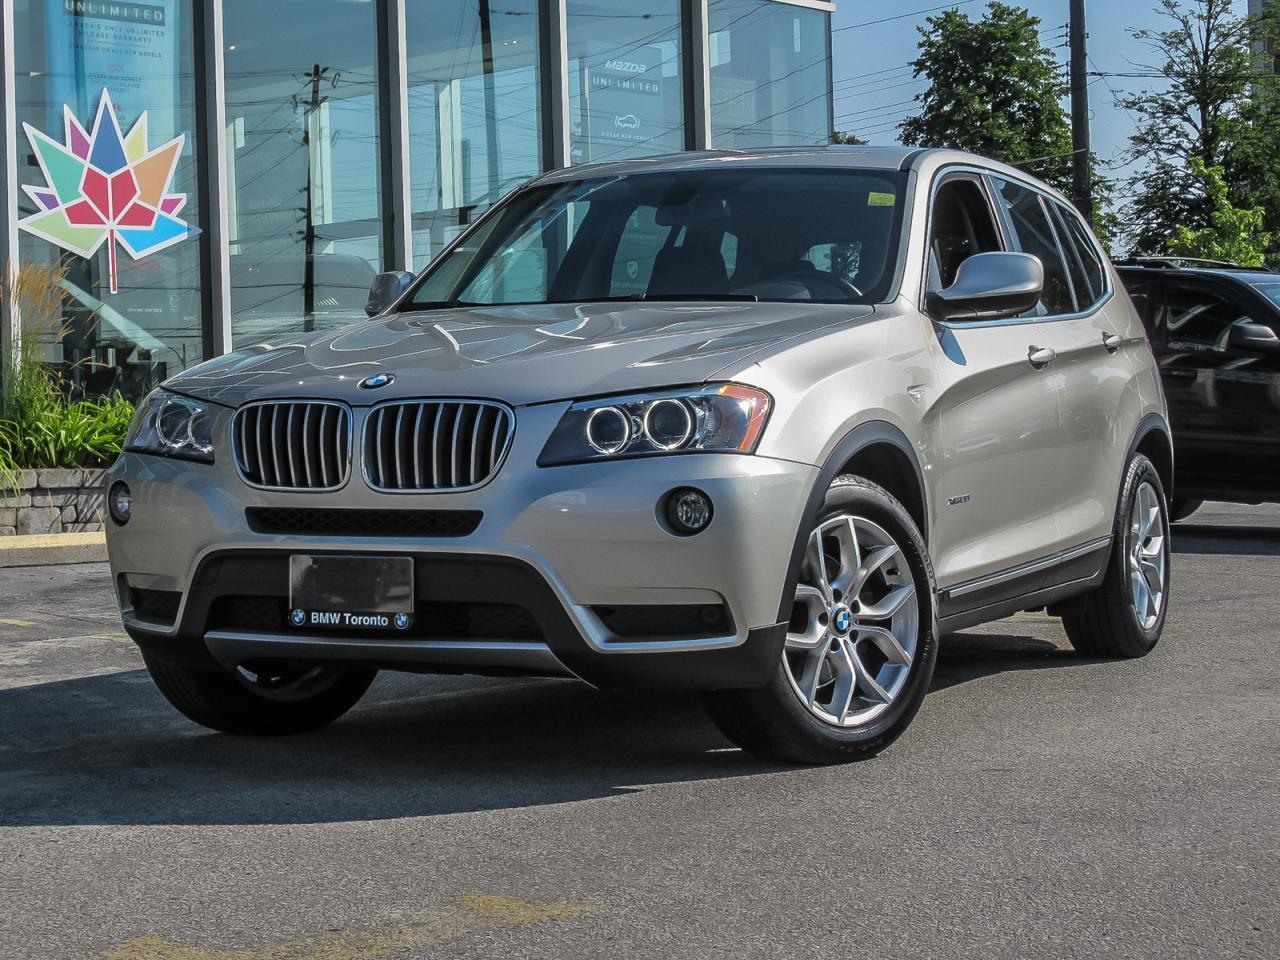 2013 BMW X3 xDrive28i NAVIGATION